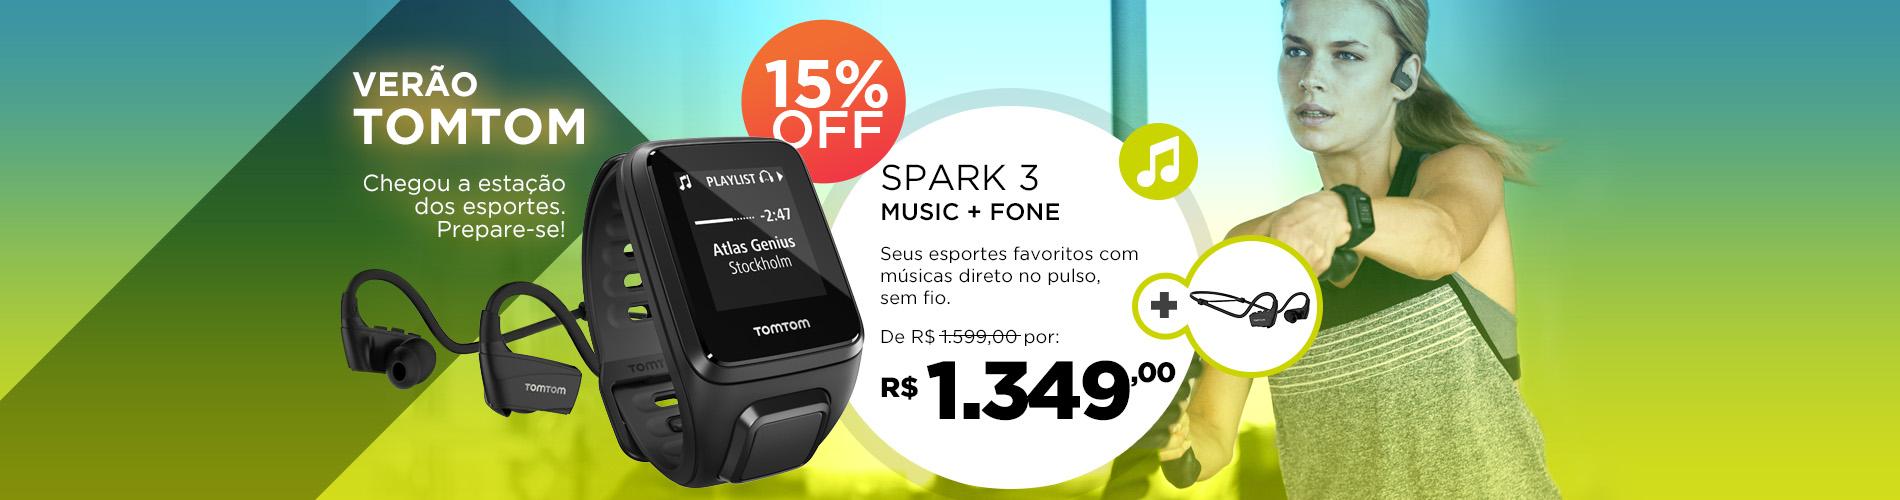 Spark 3 Music + Fone